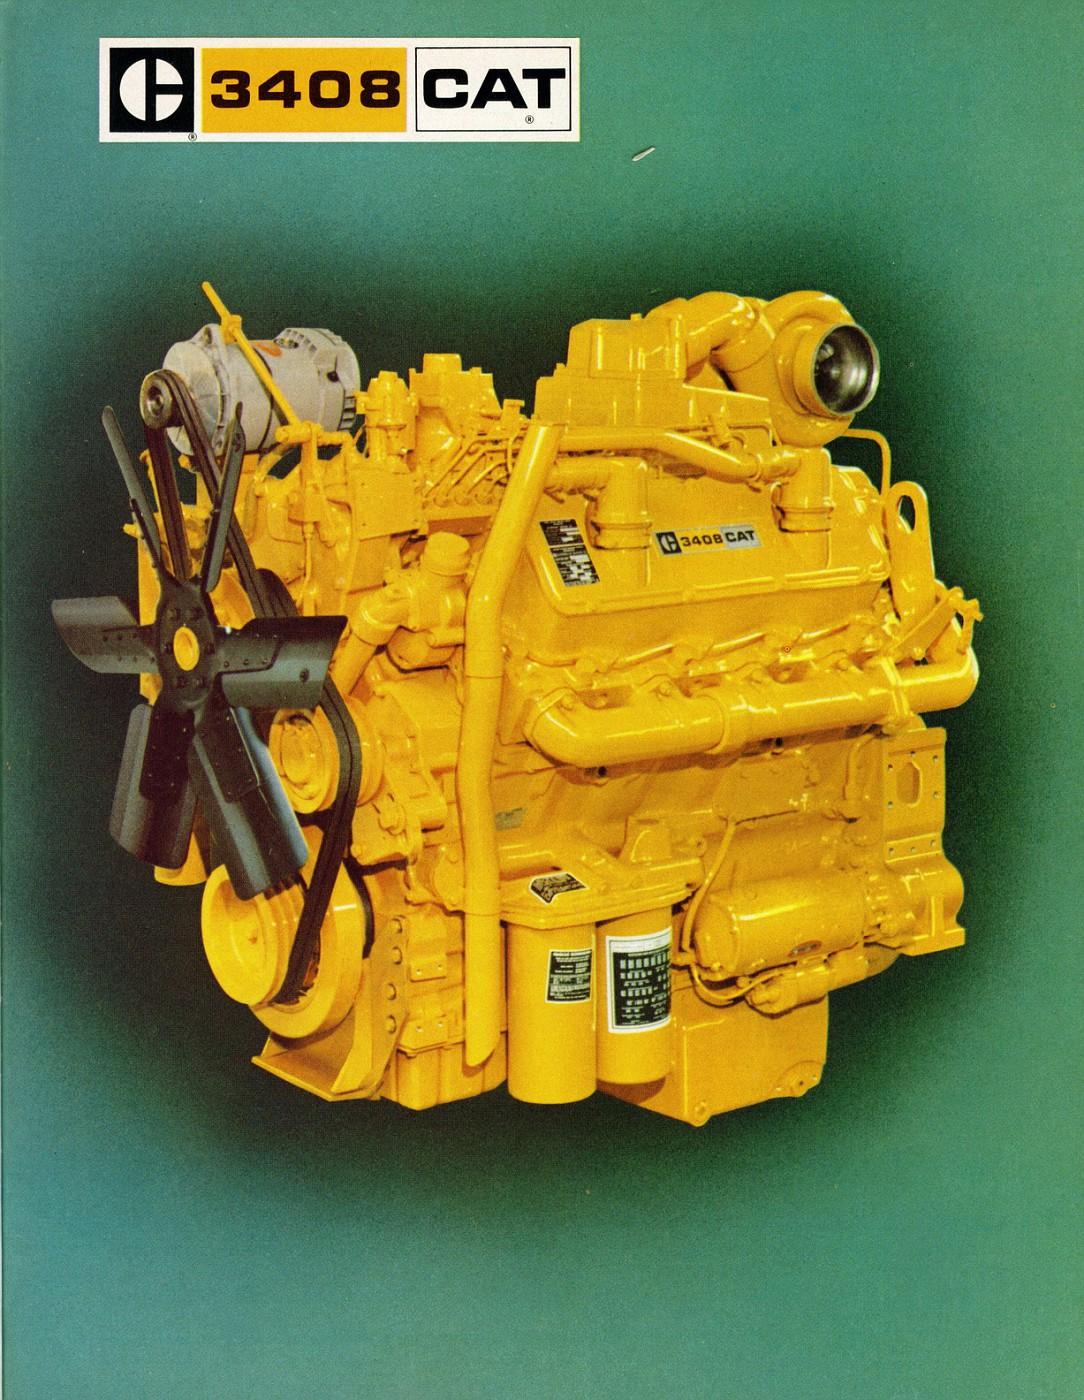 Caterpillar 3408 Truck Engine Caterpillar Engine